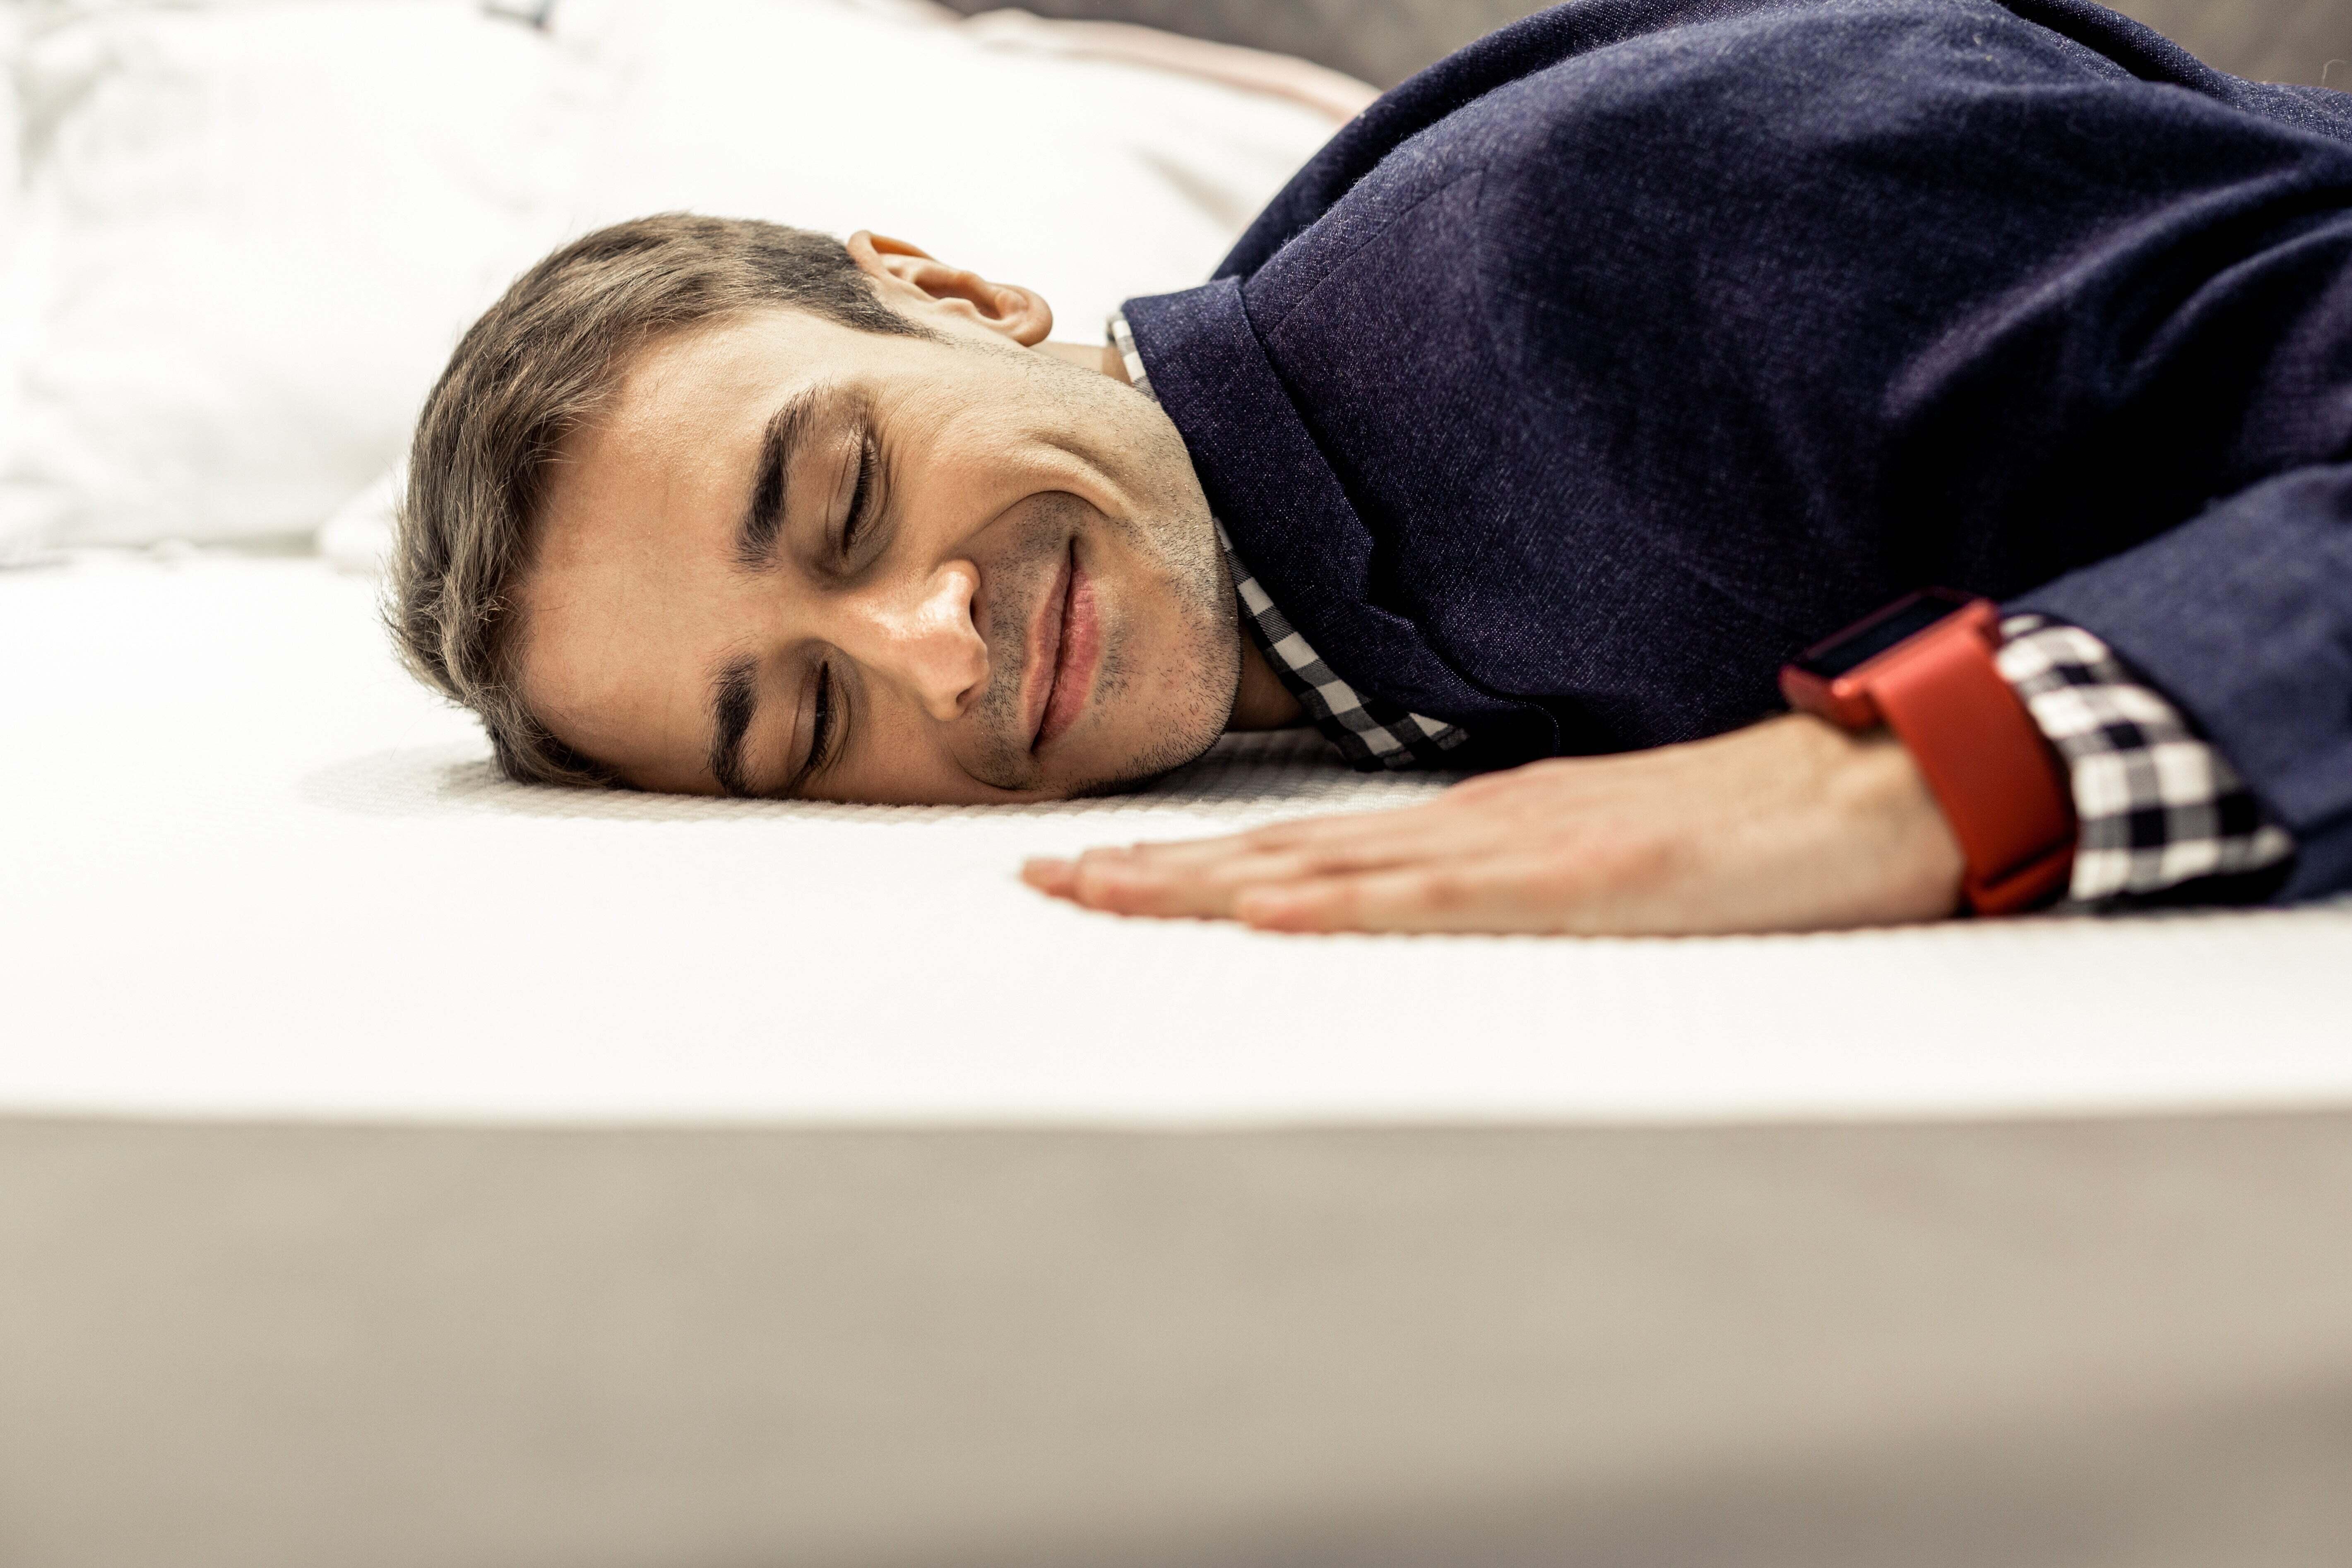 A man laying on a mattress smiling